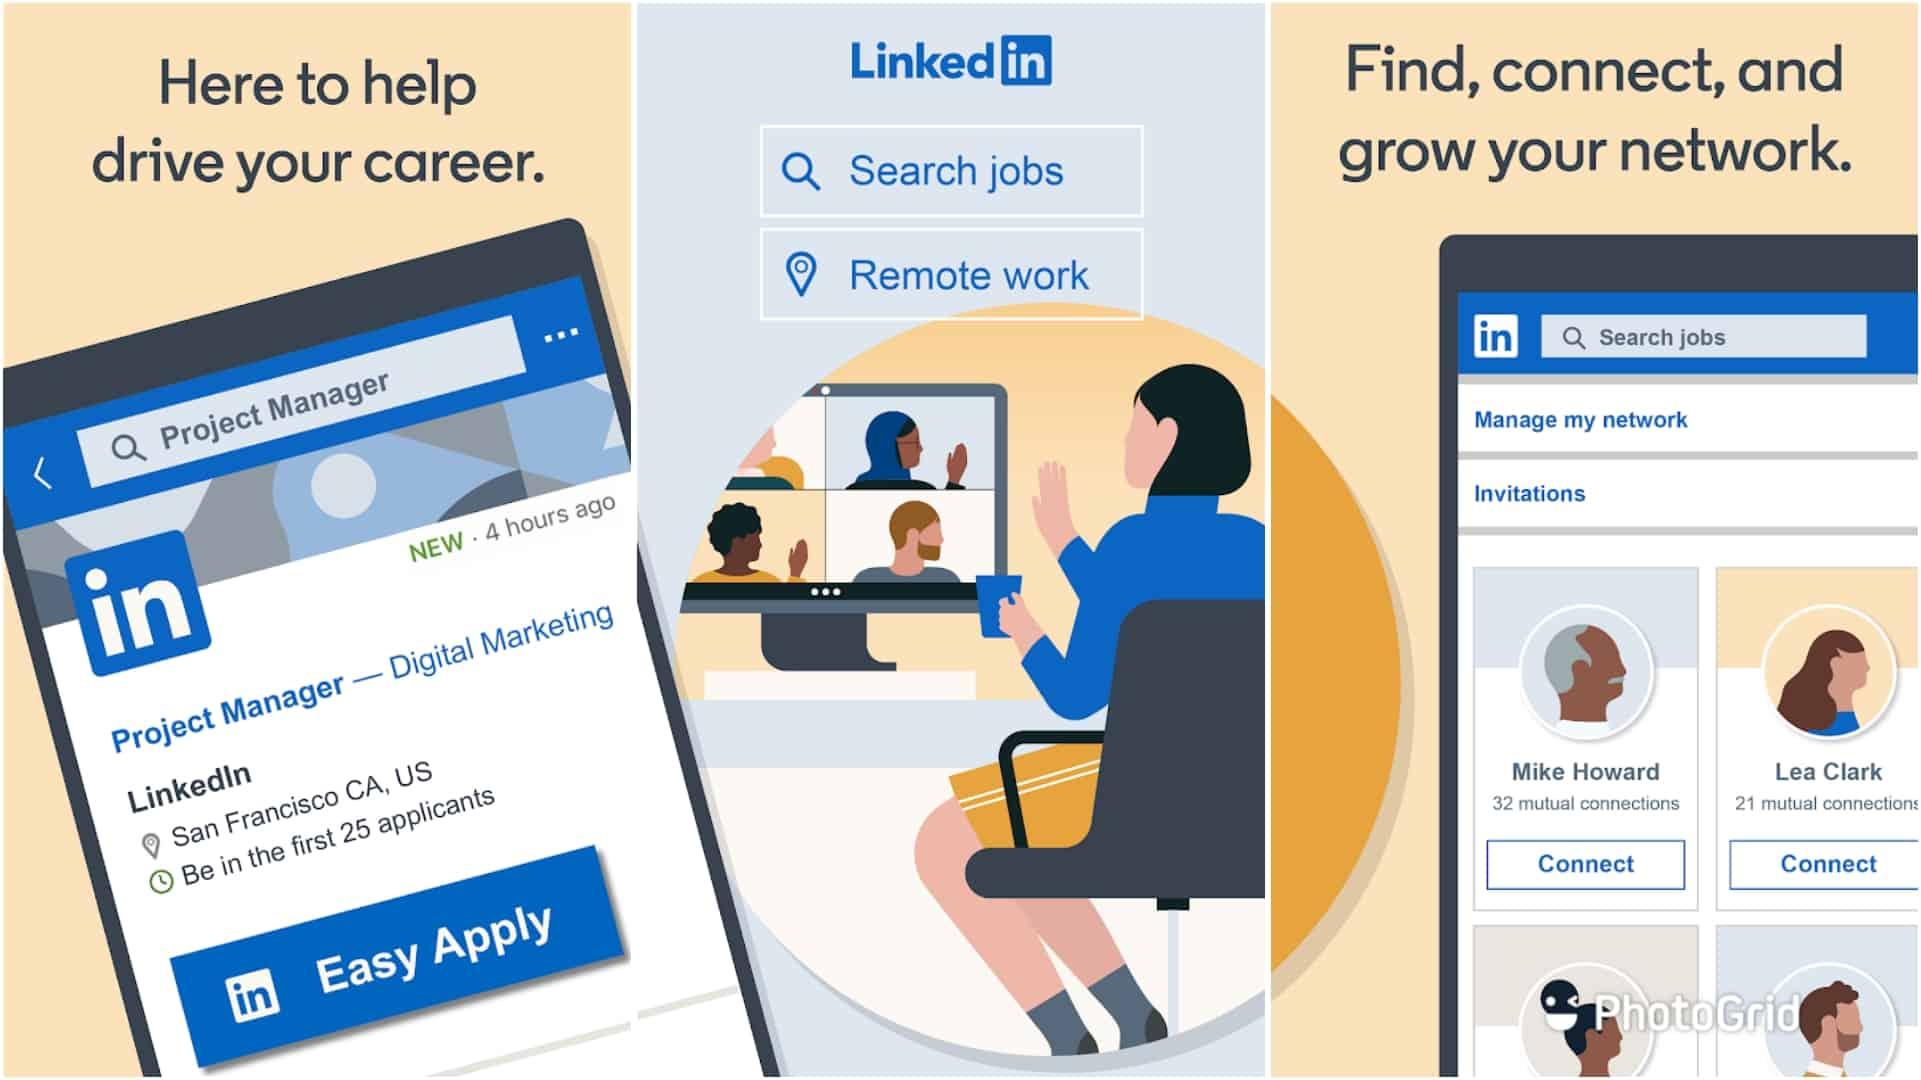 LinkedIn app image June 2020 1